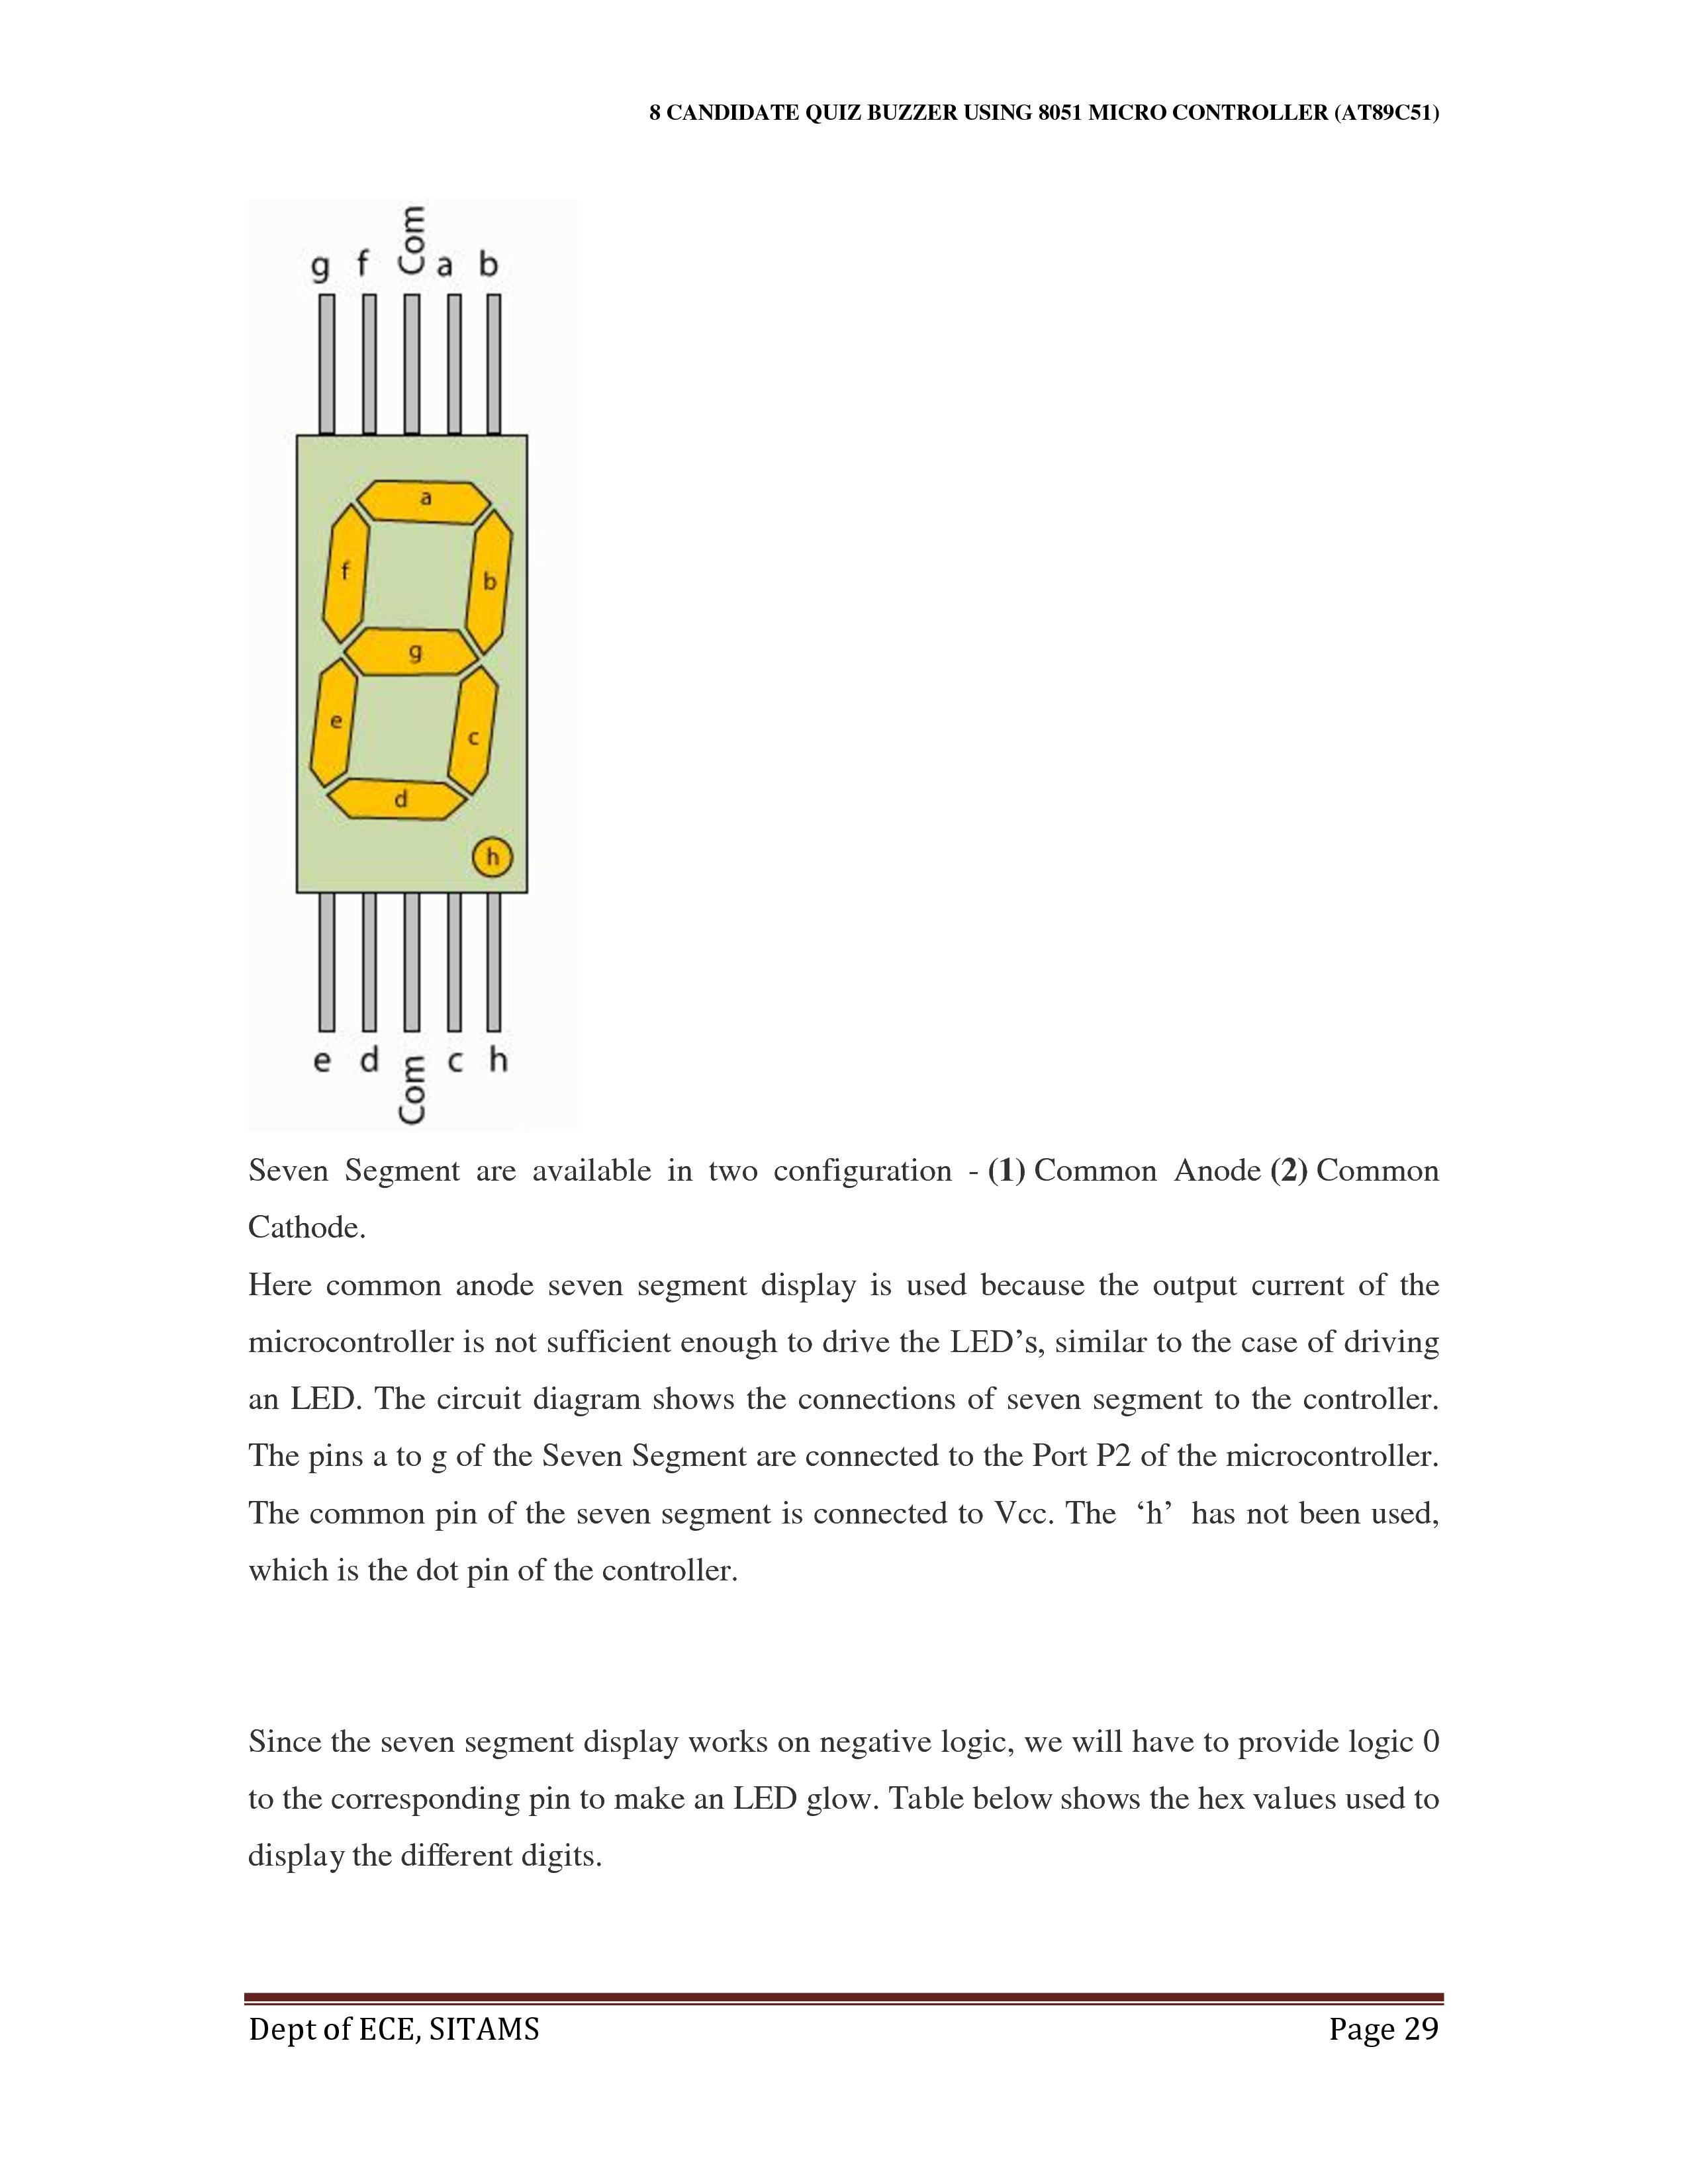 Enjoyable 8 Candidate Quiz Buzzer Using At89C51 Microcontroller Wiring Cloud Brecesaoduqqnet